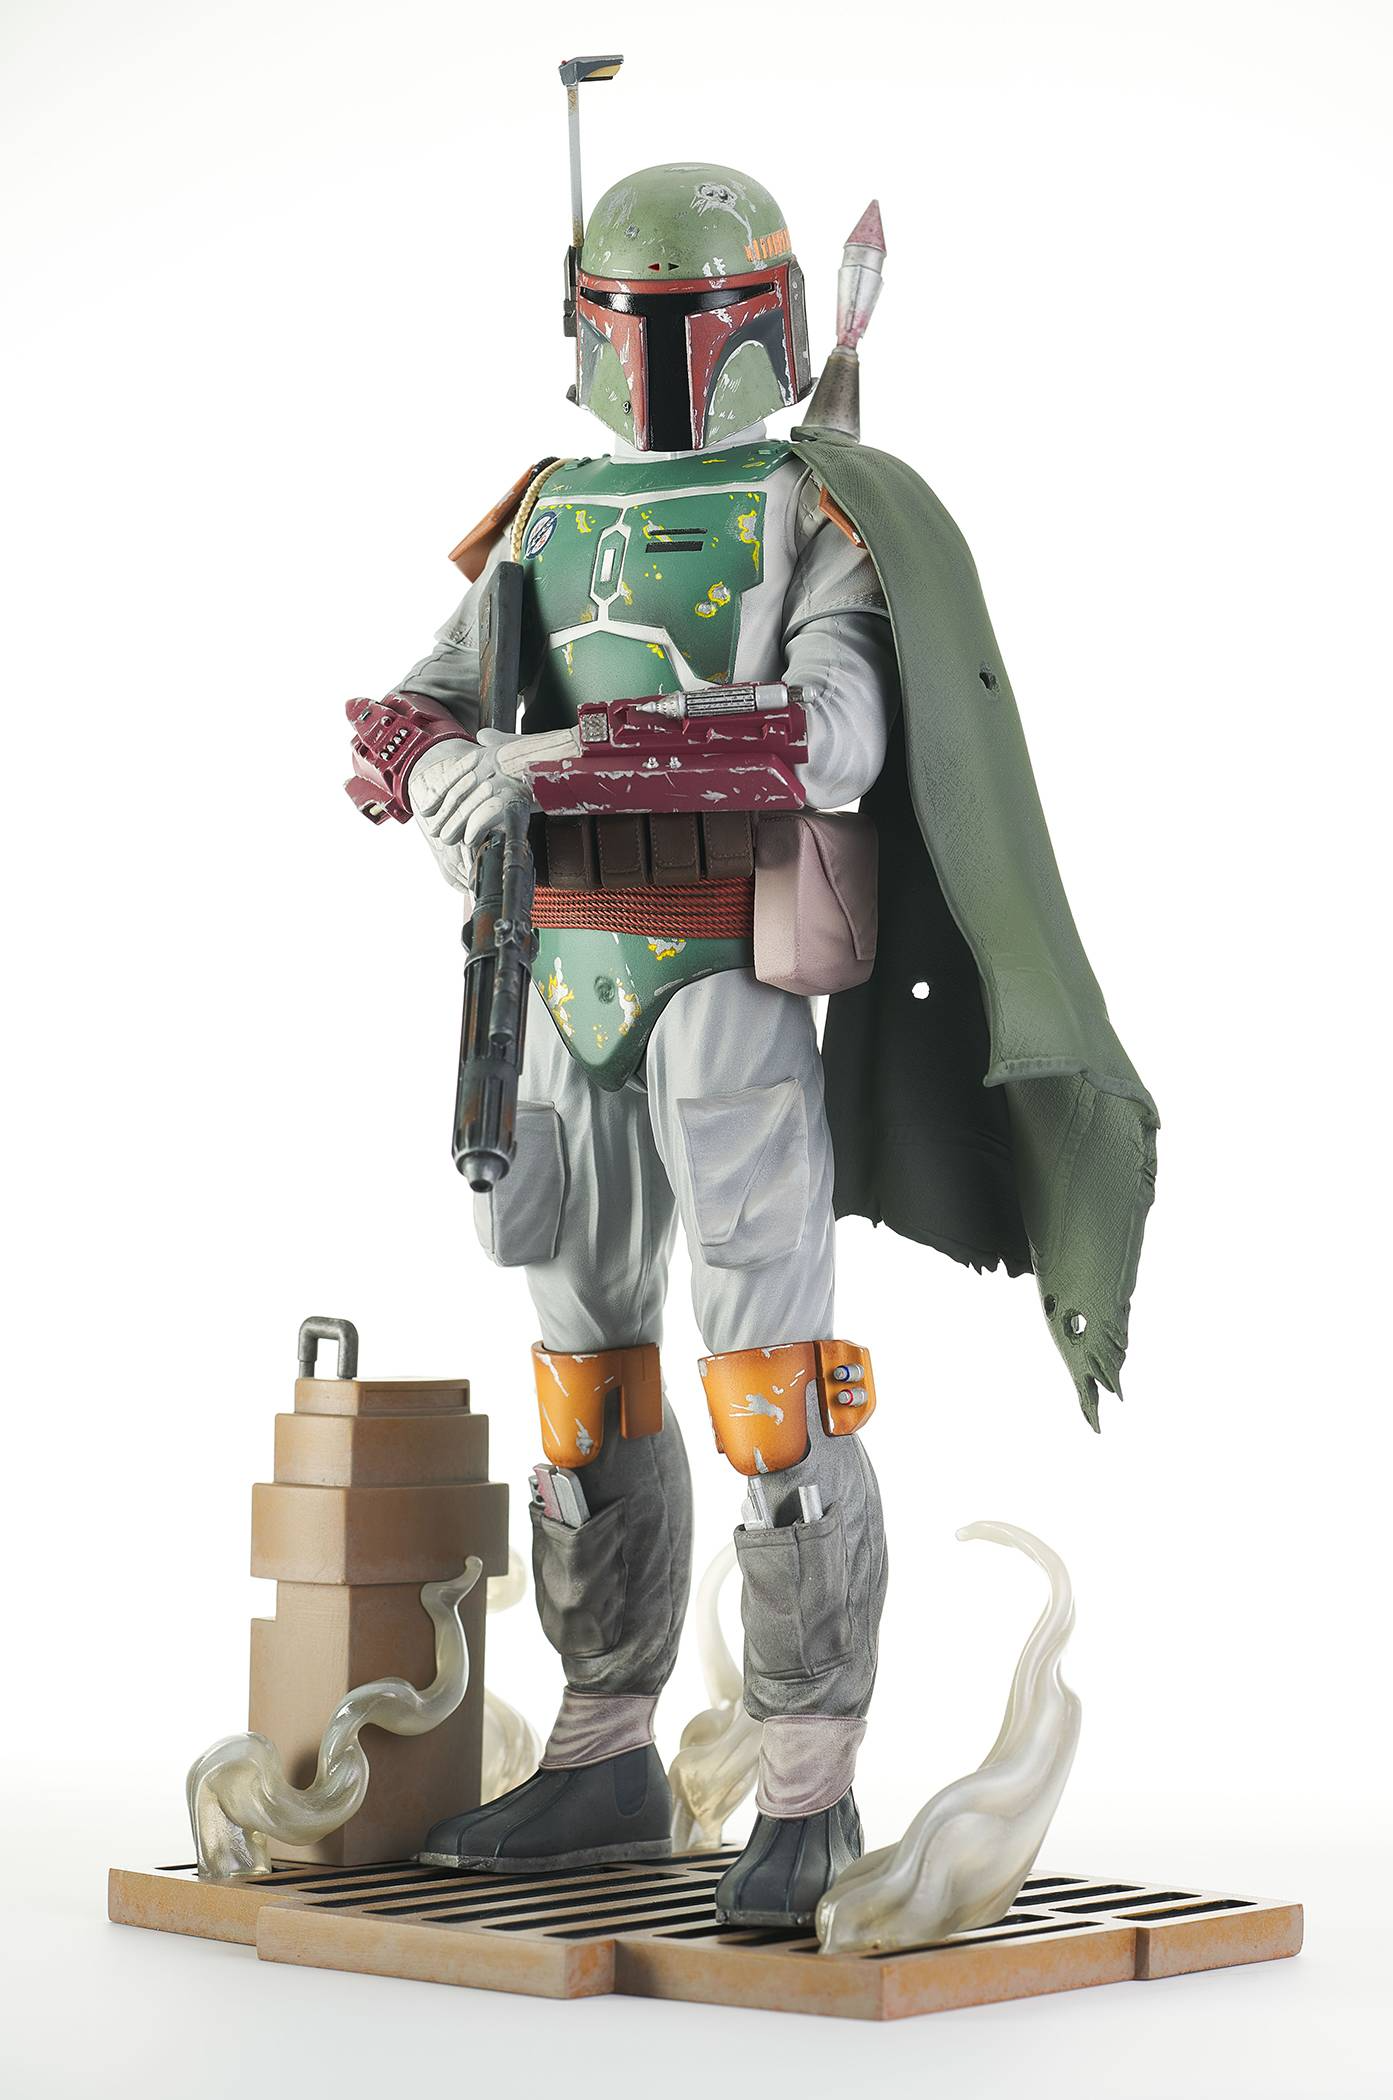 Star Wars Milestones - Return of the Jedi Boba Fett Statue